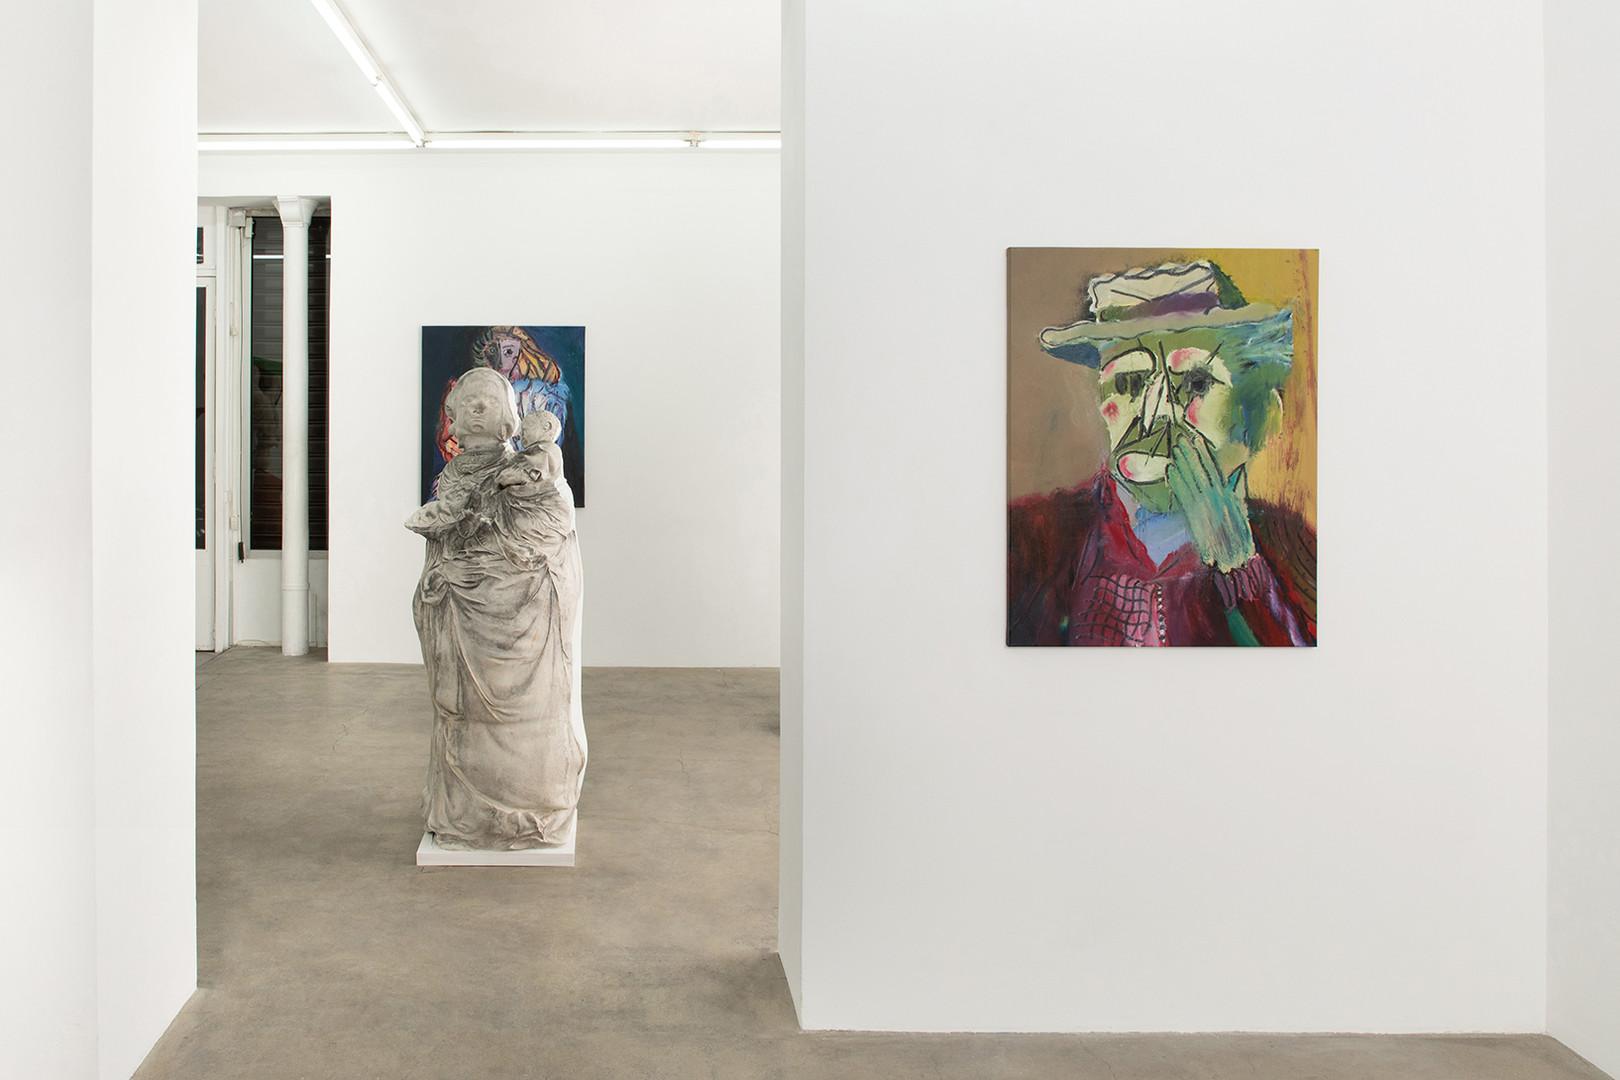 Galerie Julien Cadet Rhys Lee Recent Paintings Background : Ken Sortais' sculpture   ©Credits photo : Thomas Marroni